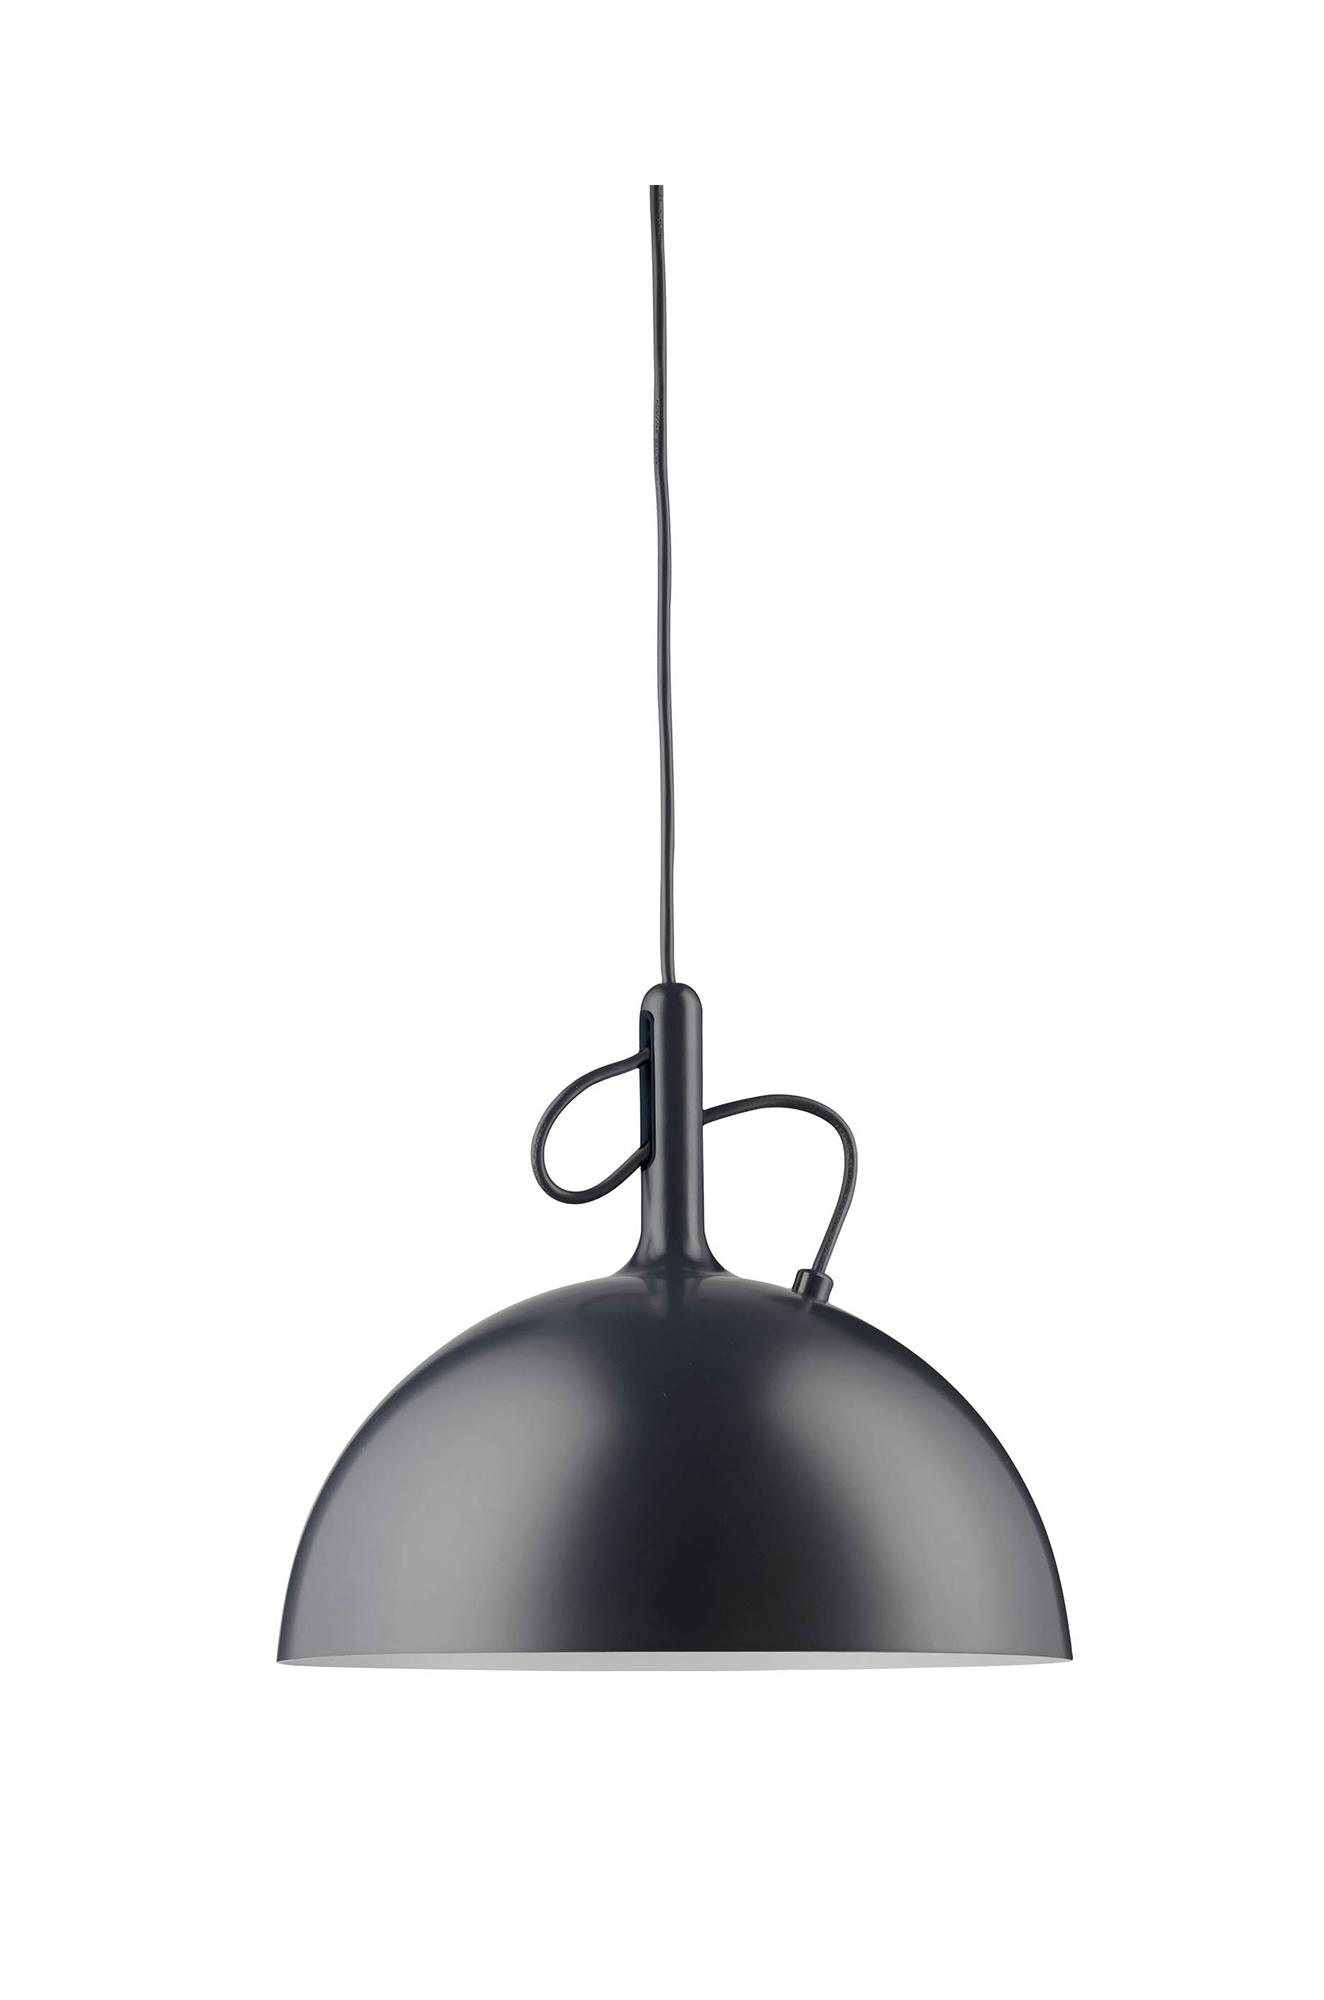 Image of   Adjustable Pendant (Black) Ø30 cm